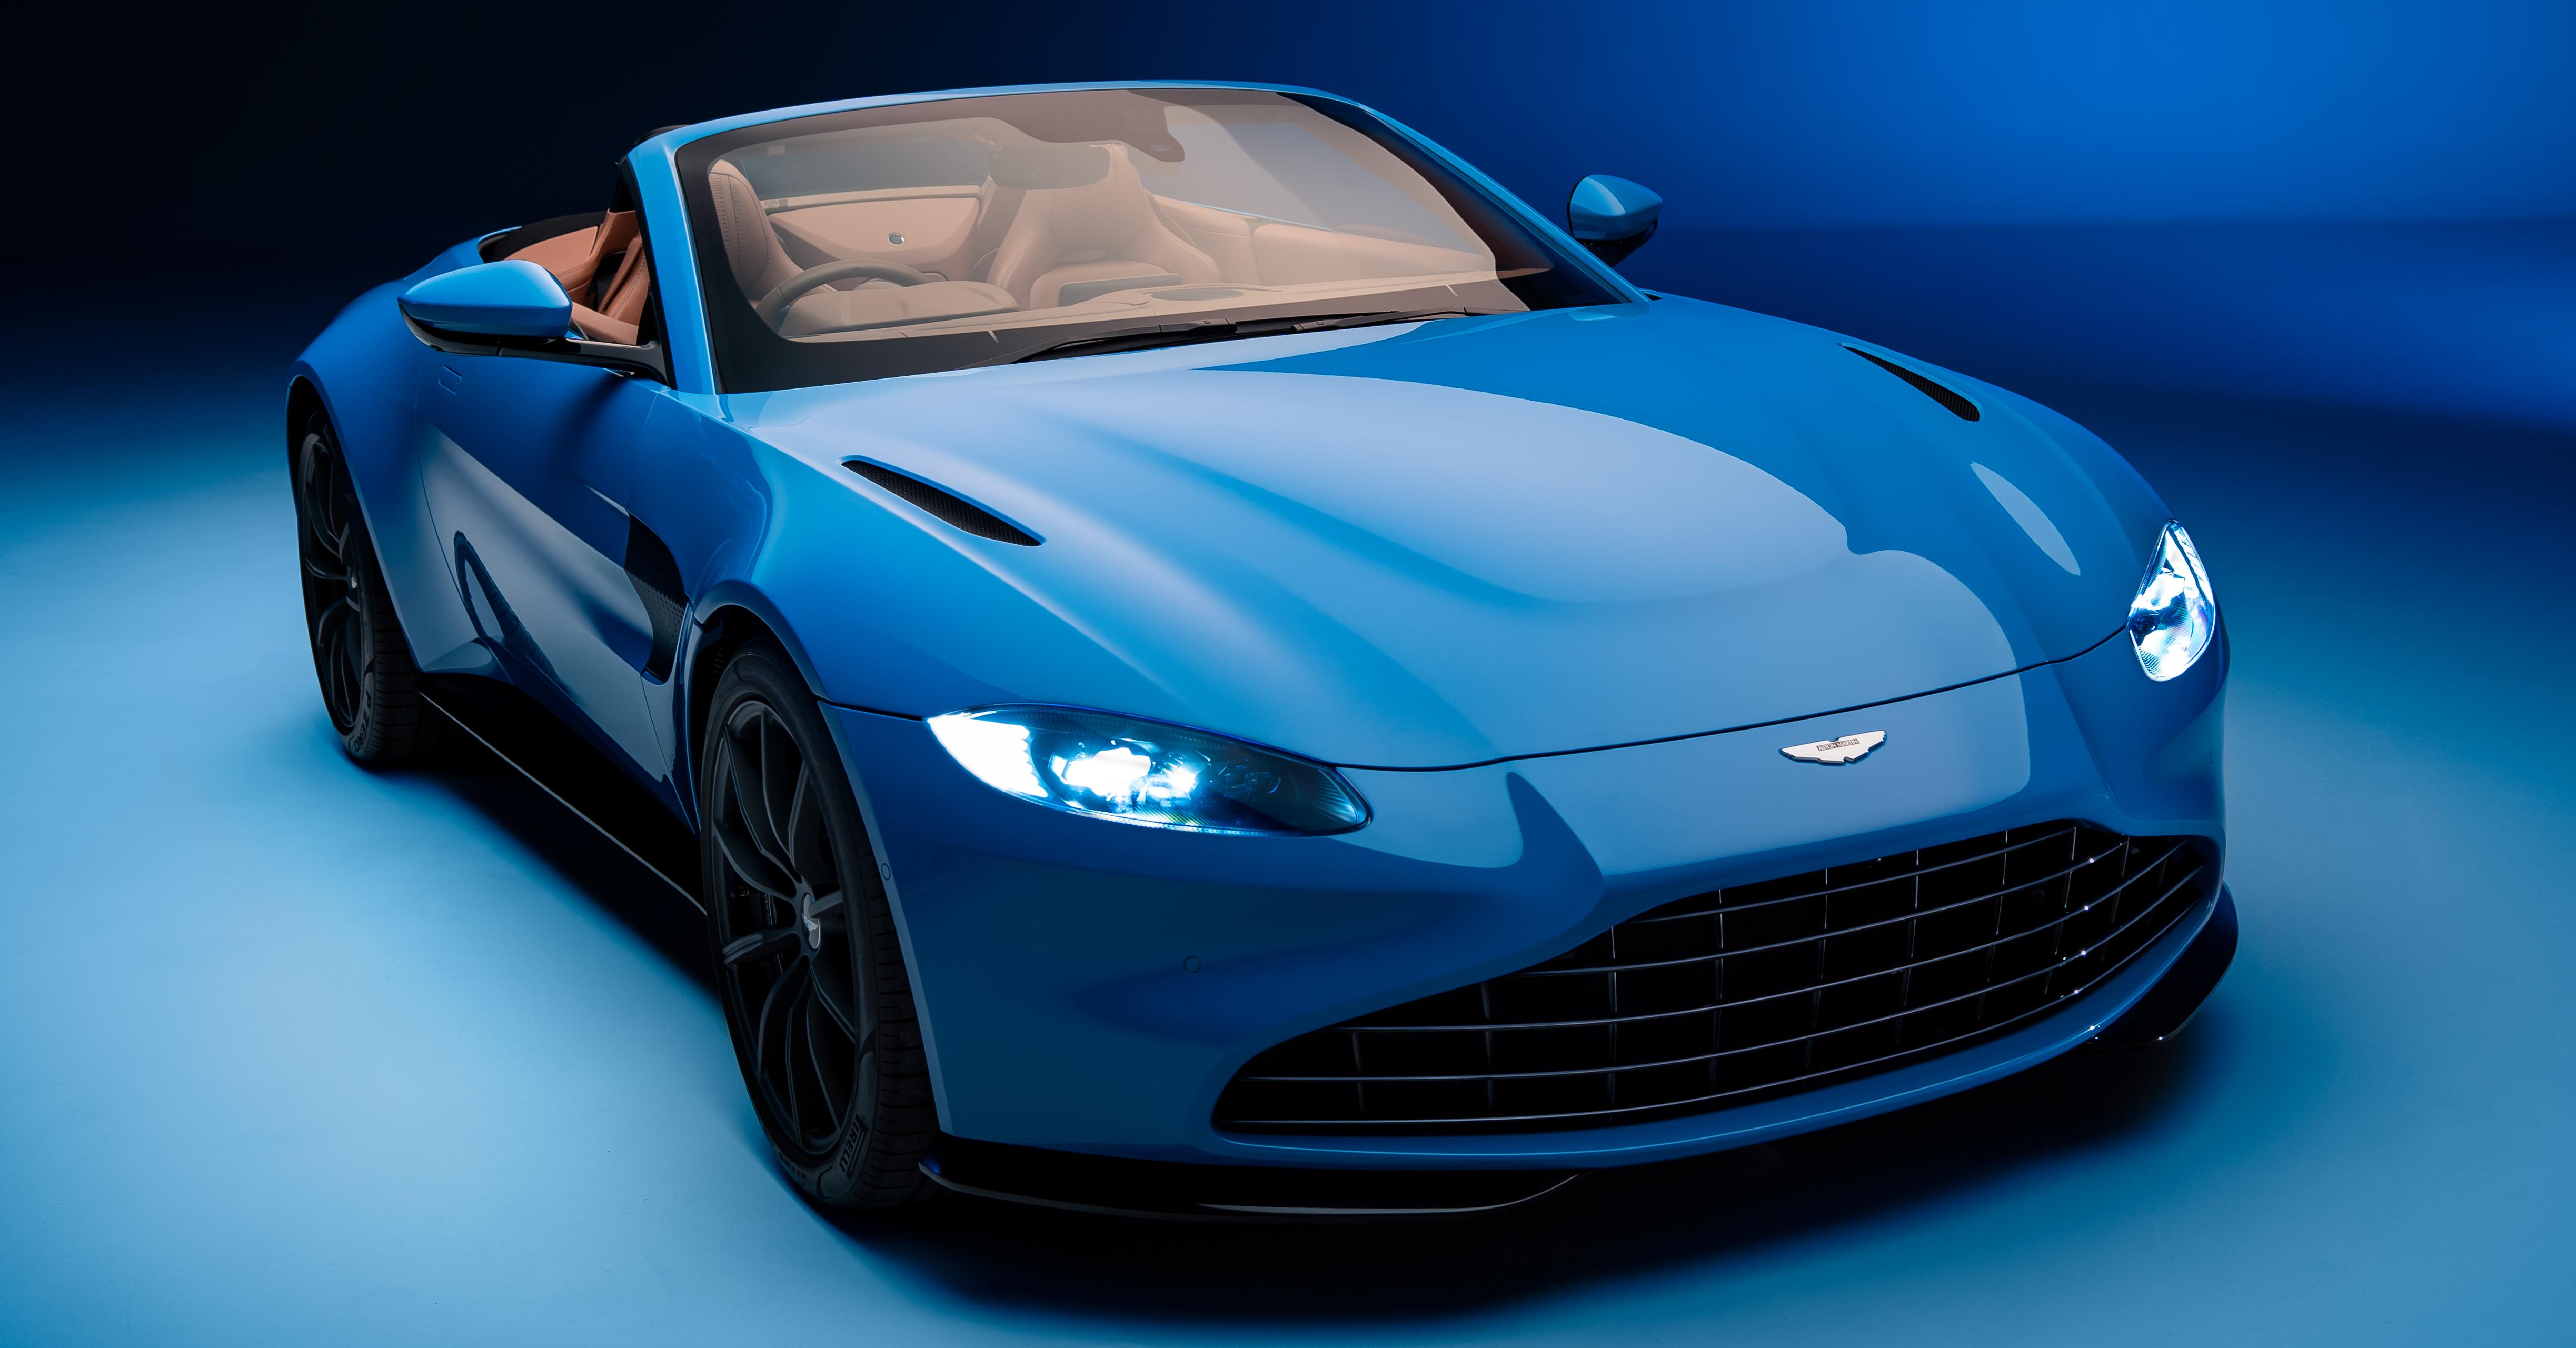 2020-aston-martin-vantage-roadster-2.jpg